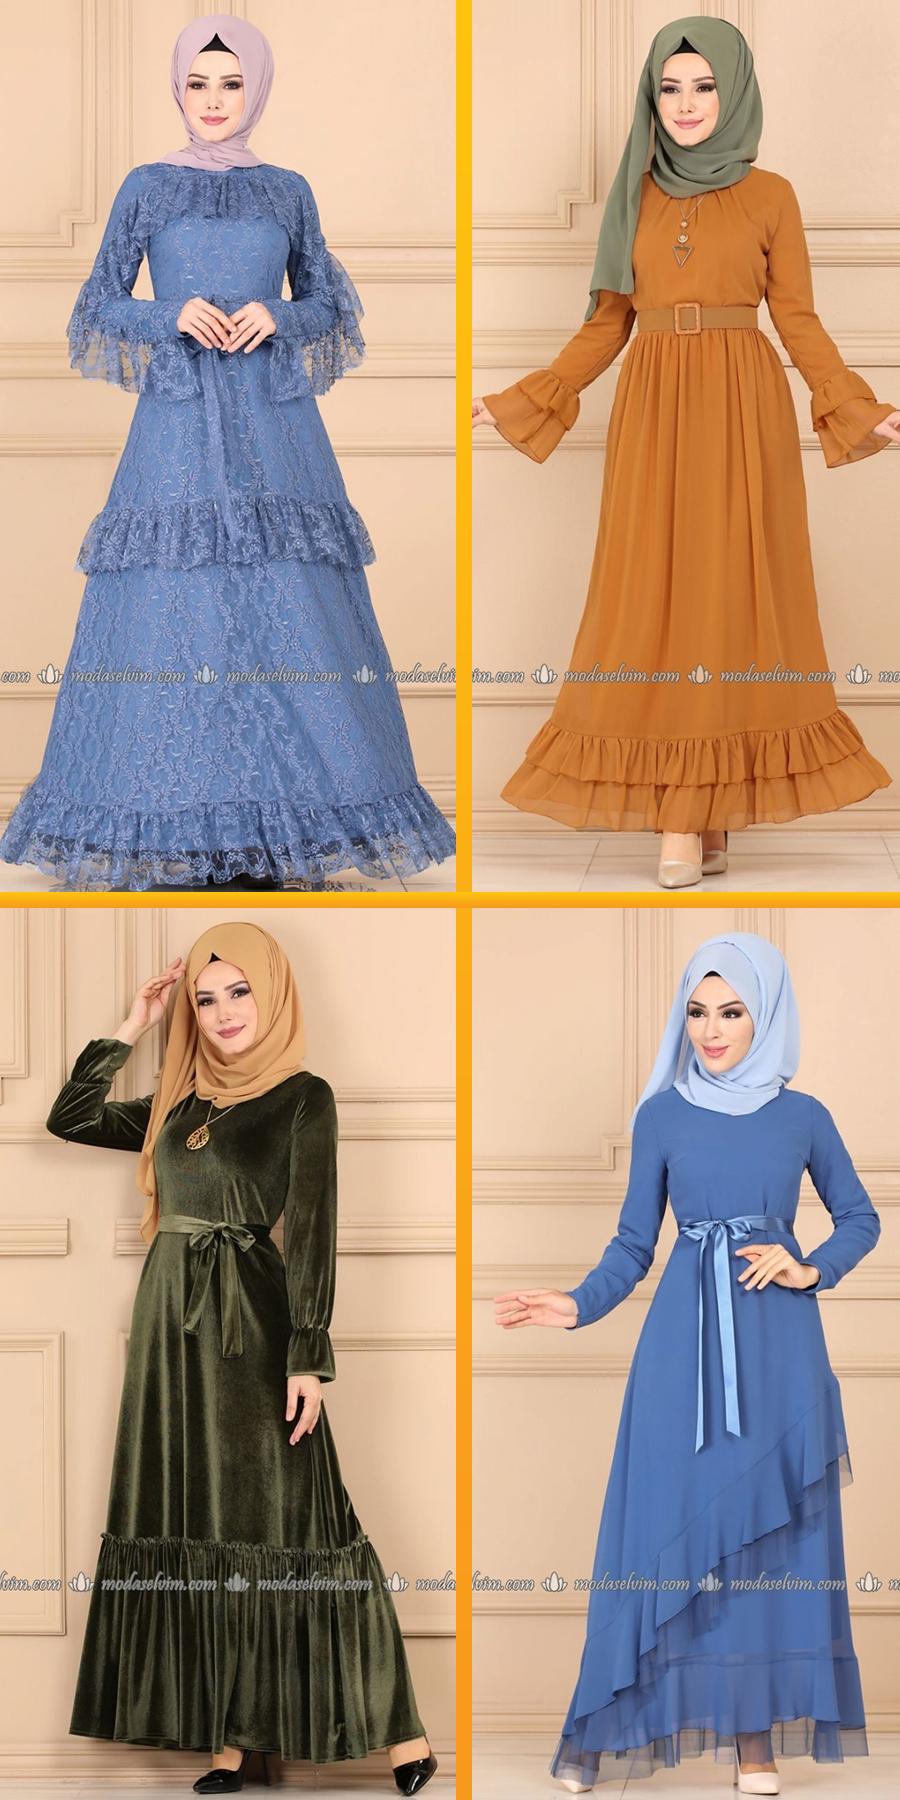 Firfirli Elbise Modelleri Modaselvim 2020 Firfirli Elbise Modelleri Elbise Modelleri Moda Stilleri Islami Moda